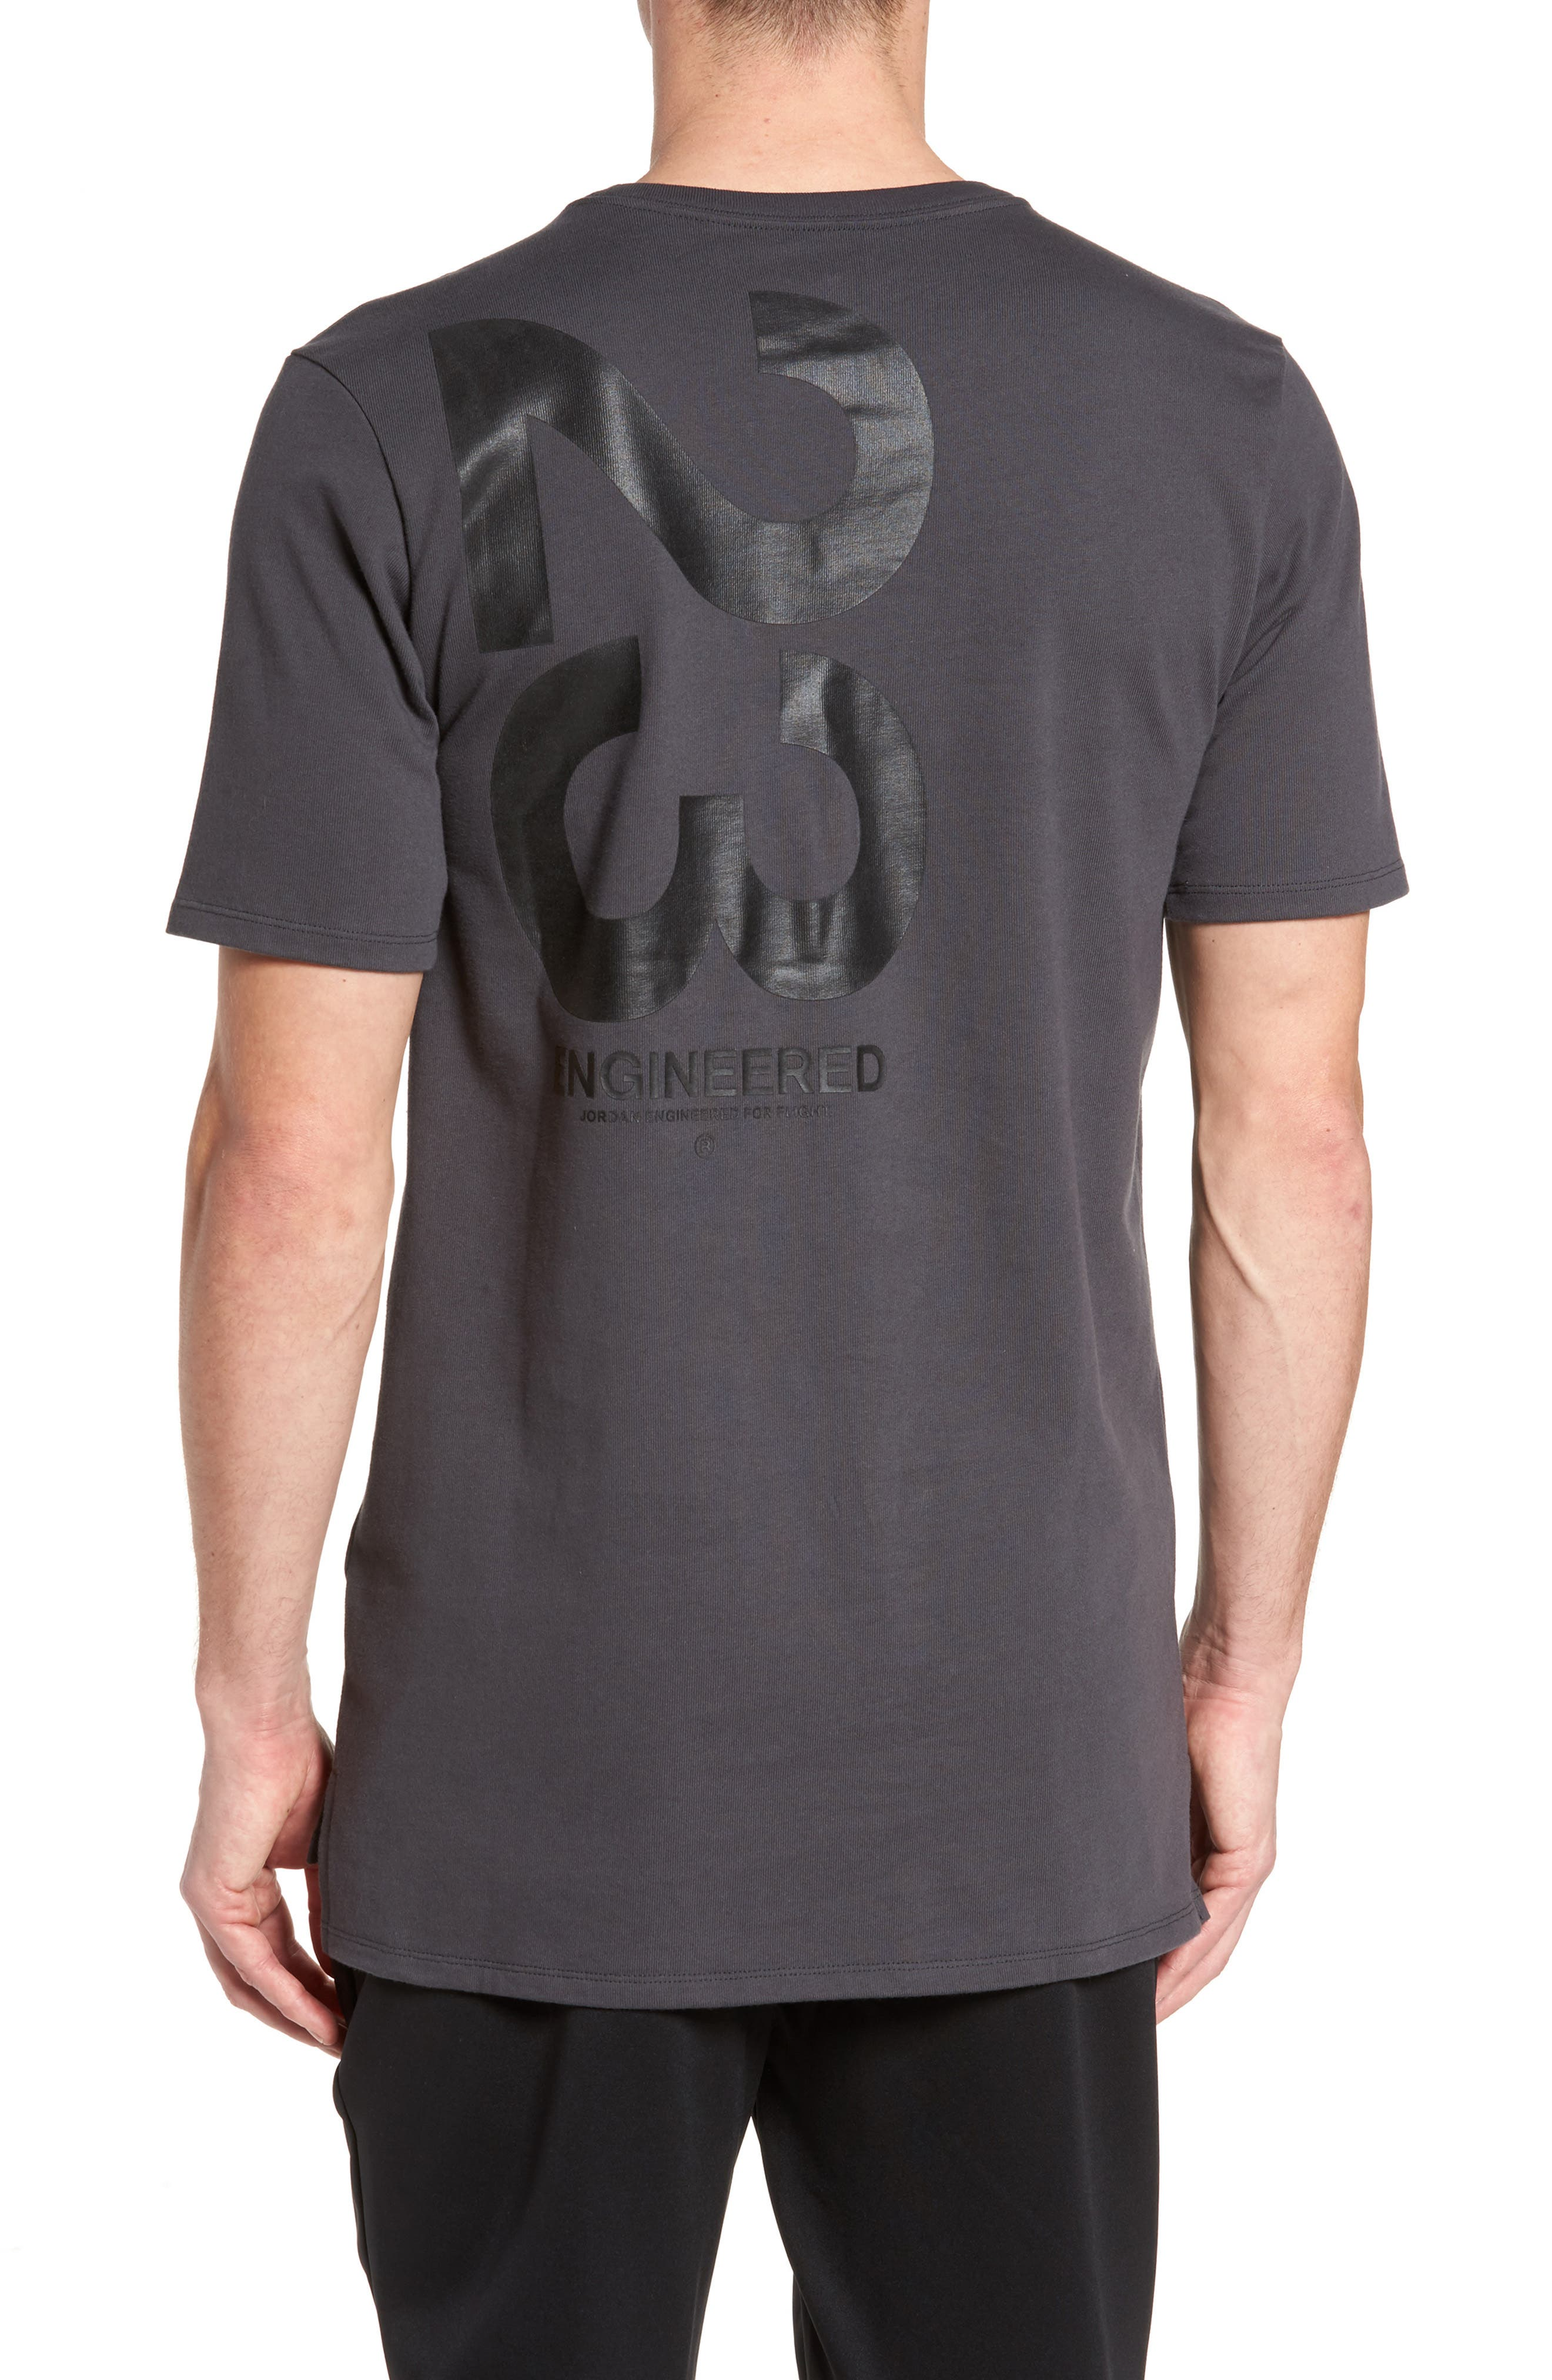 Sportswear 23 Engineered T-Shirt,                             Alternate thumbnail 2, color,                             060